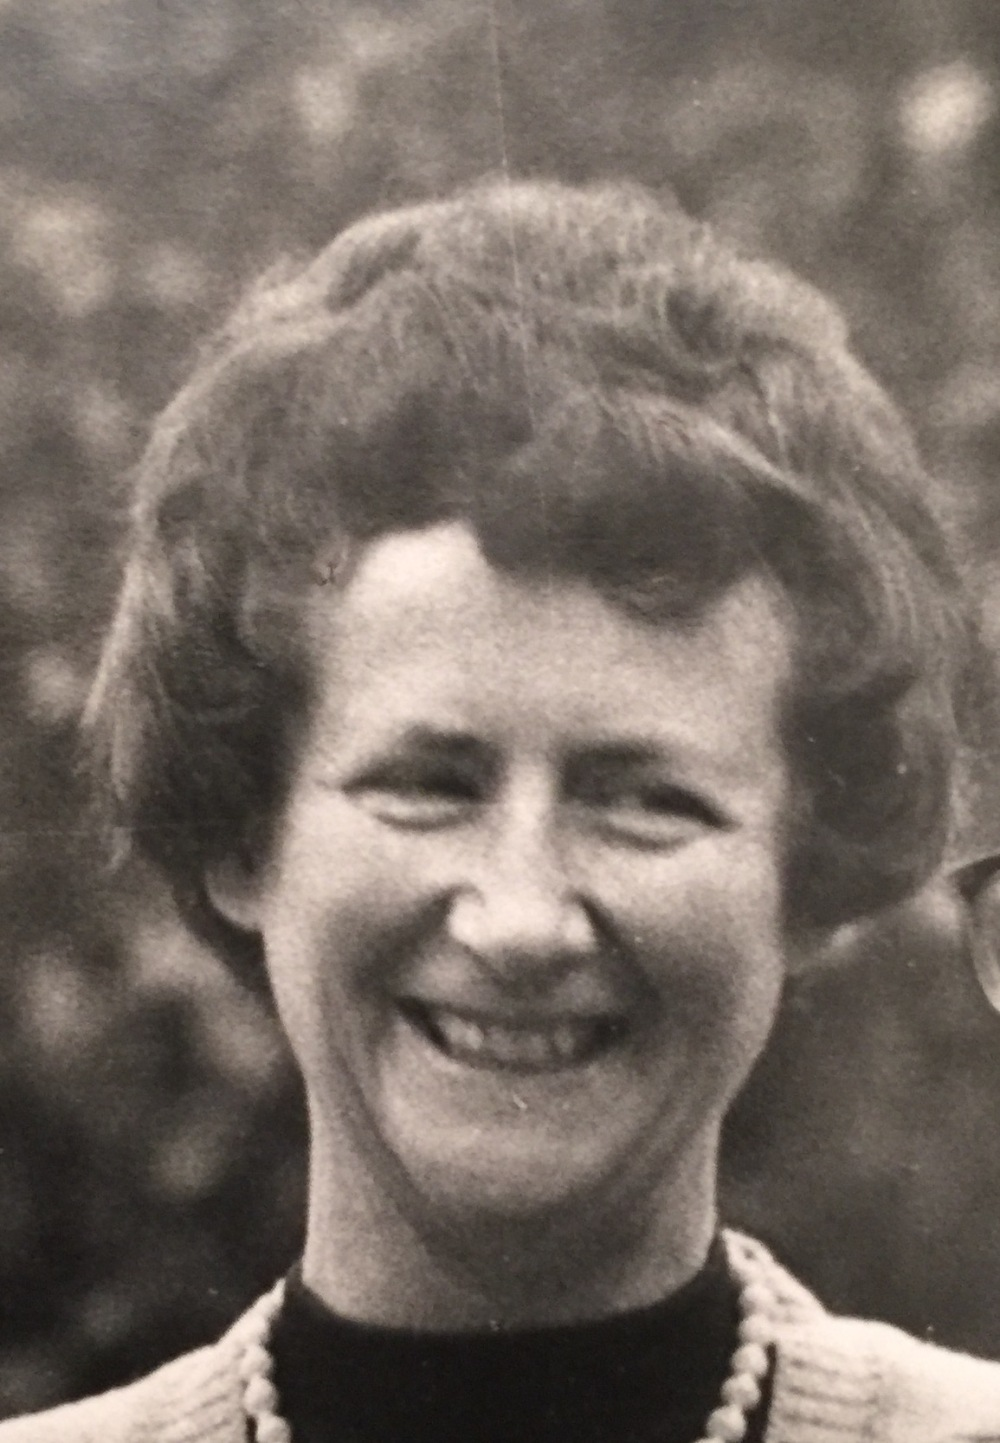 Rita Aged 47 - 1976